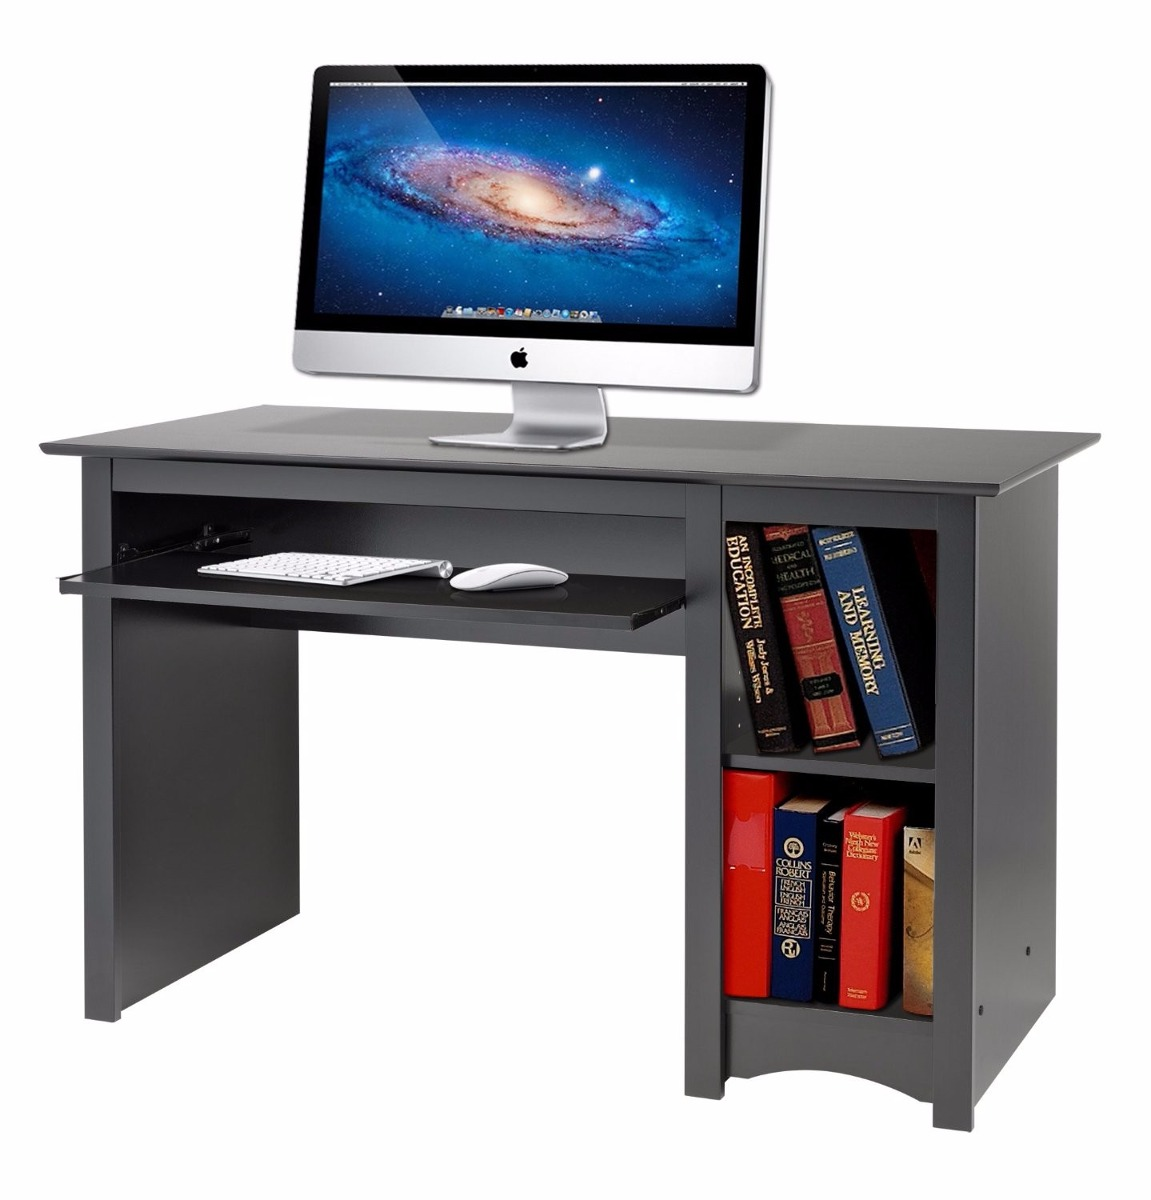 Escritorio mueble para computadora de prepac sonoma vbf - Escritorio pared ...